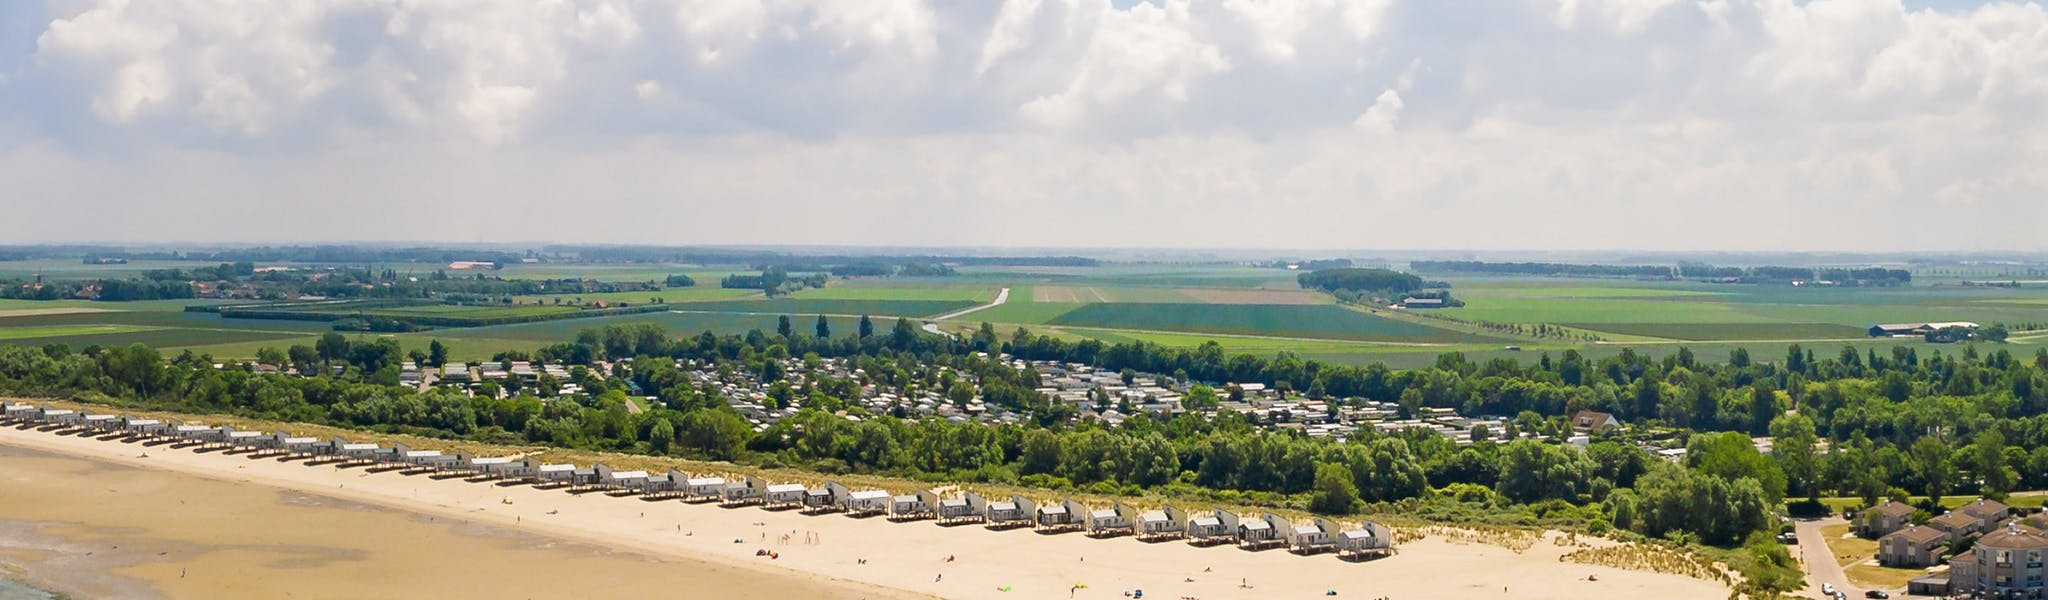 Camping Roompot Beach Resort  aan strand